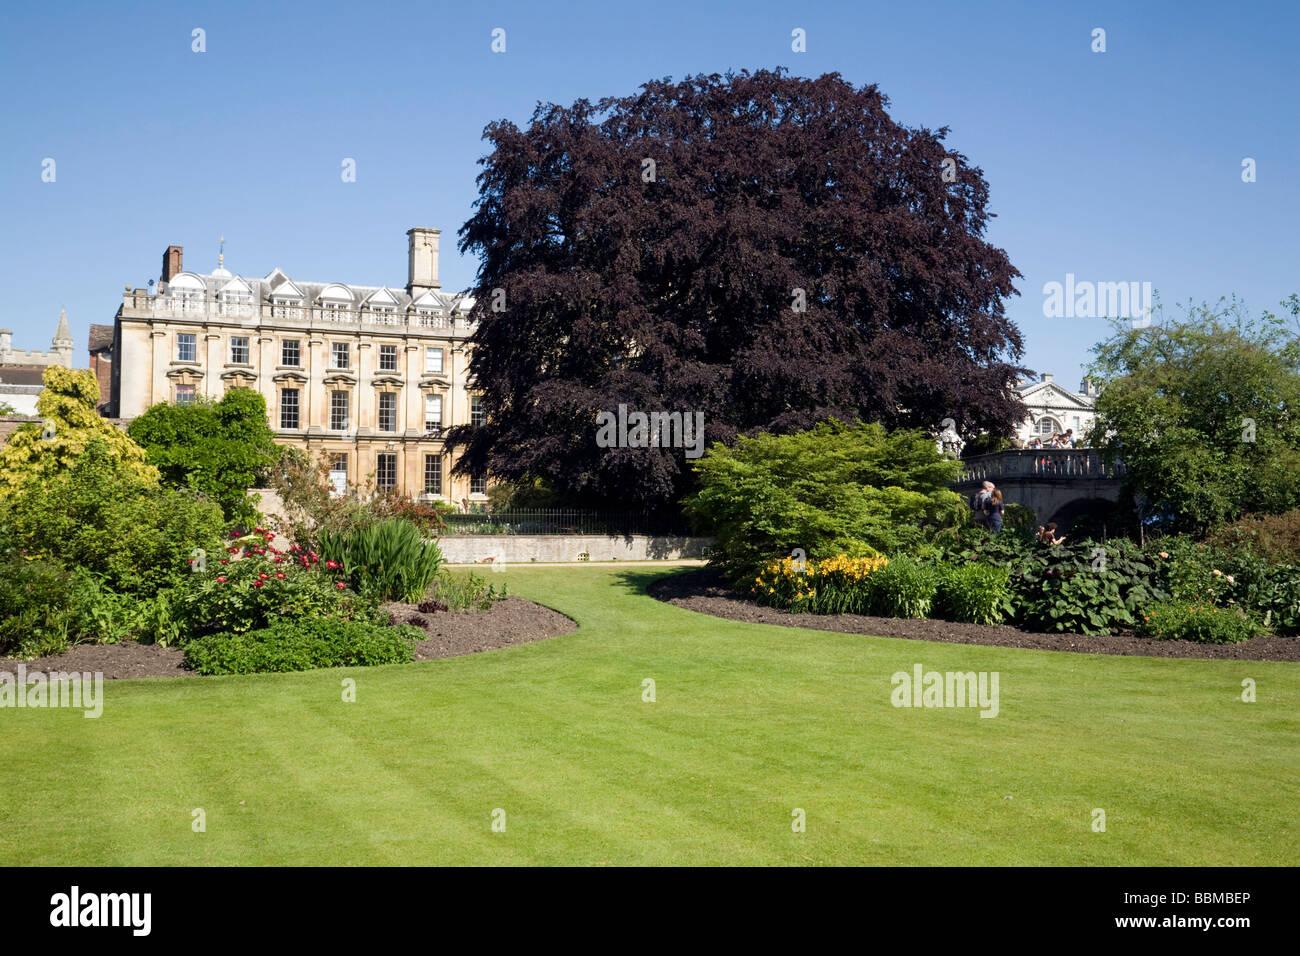 The Fellows Garden, Clare College, Cambridge University, UK - Stock Image